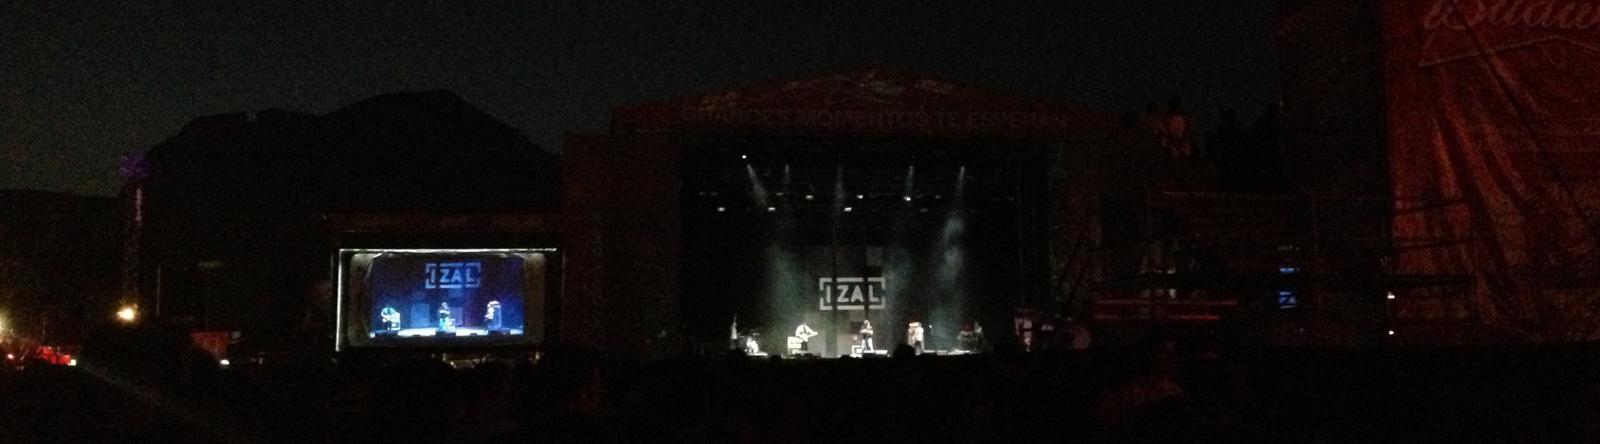 Izal festivalideal